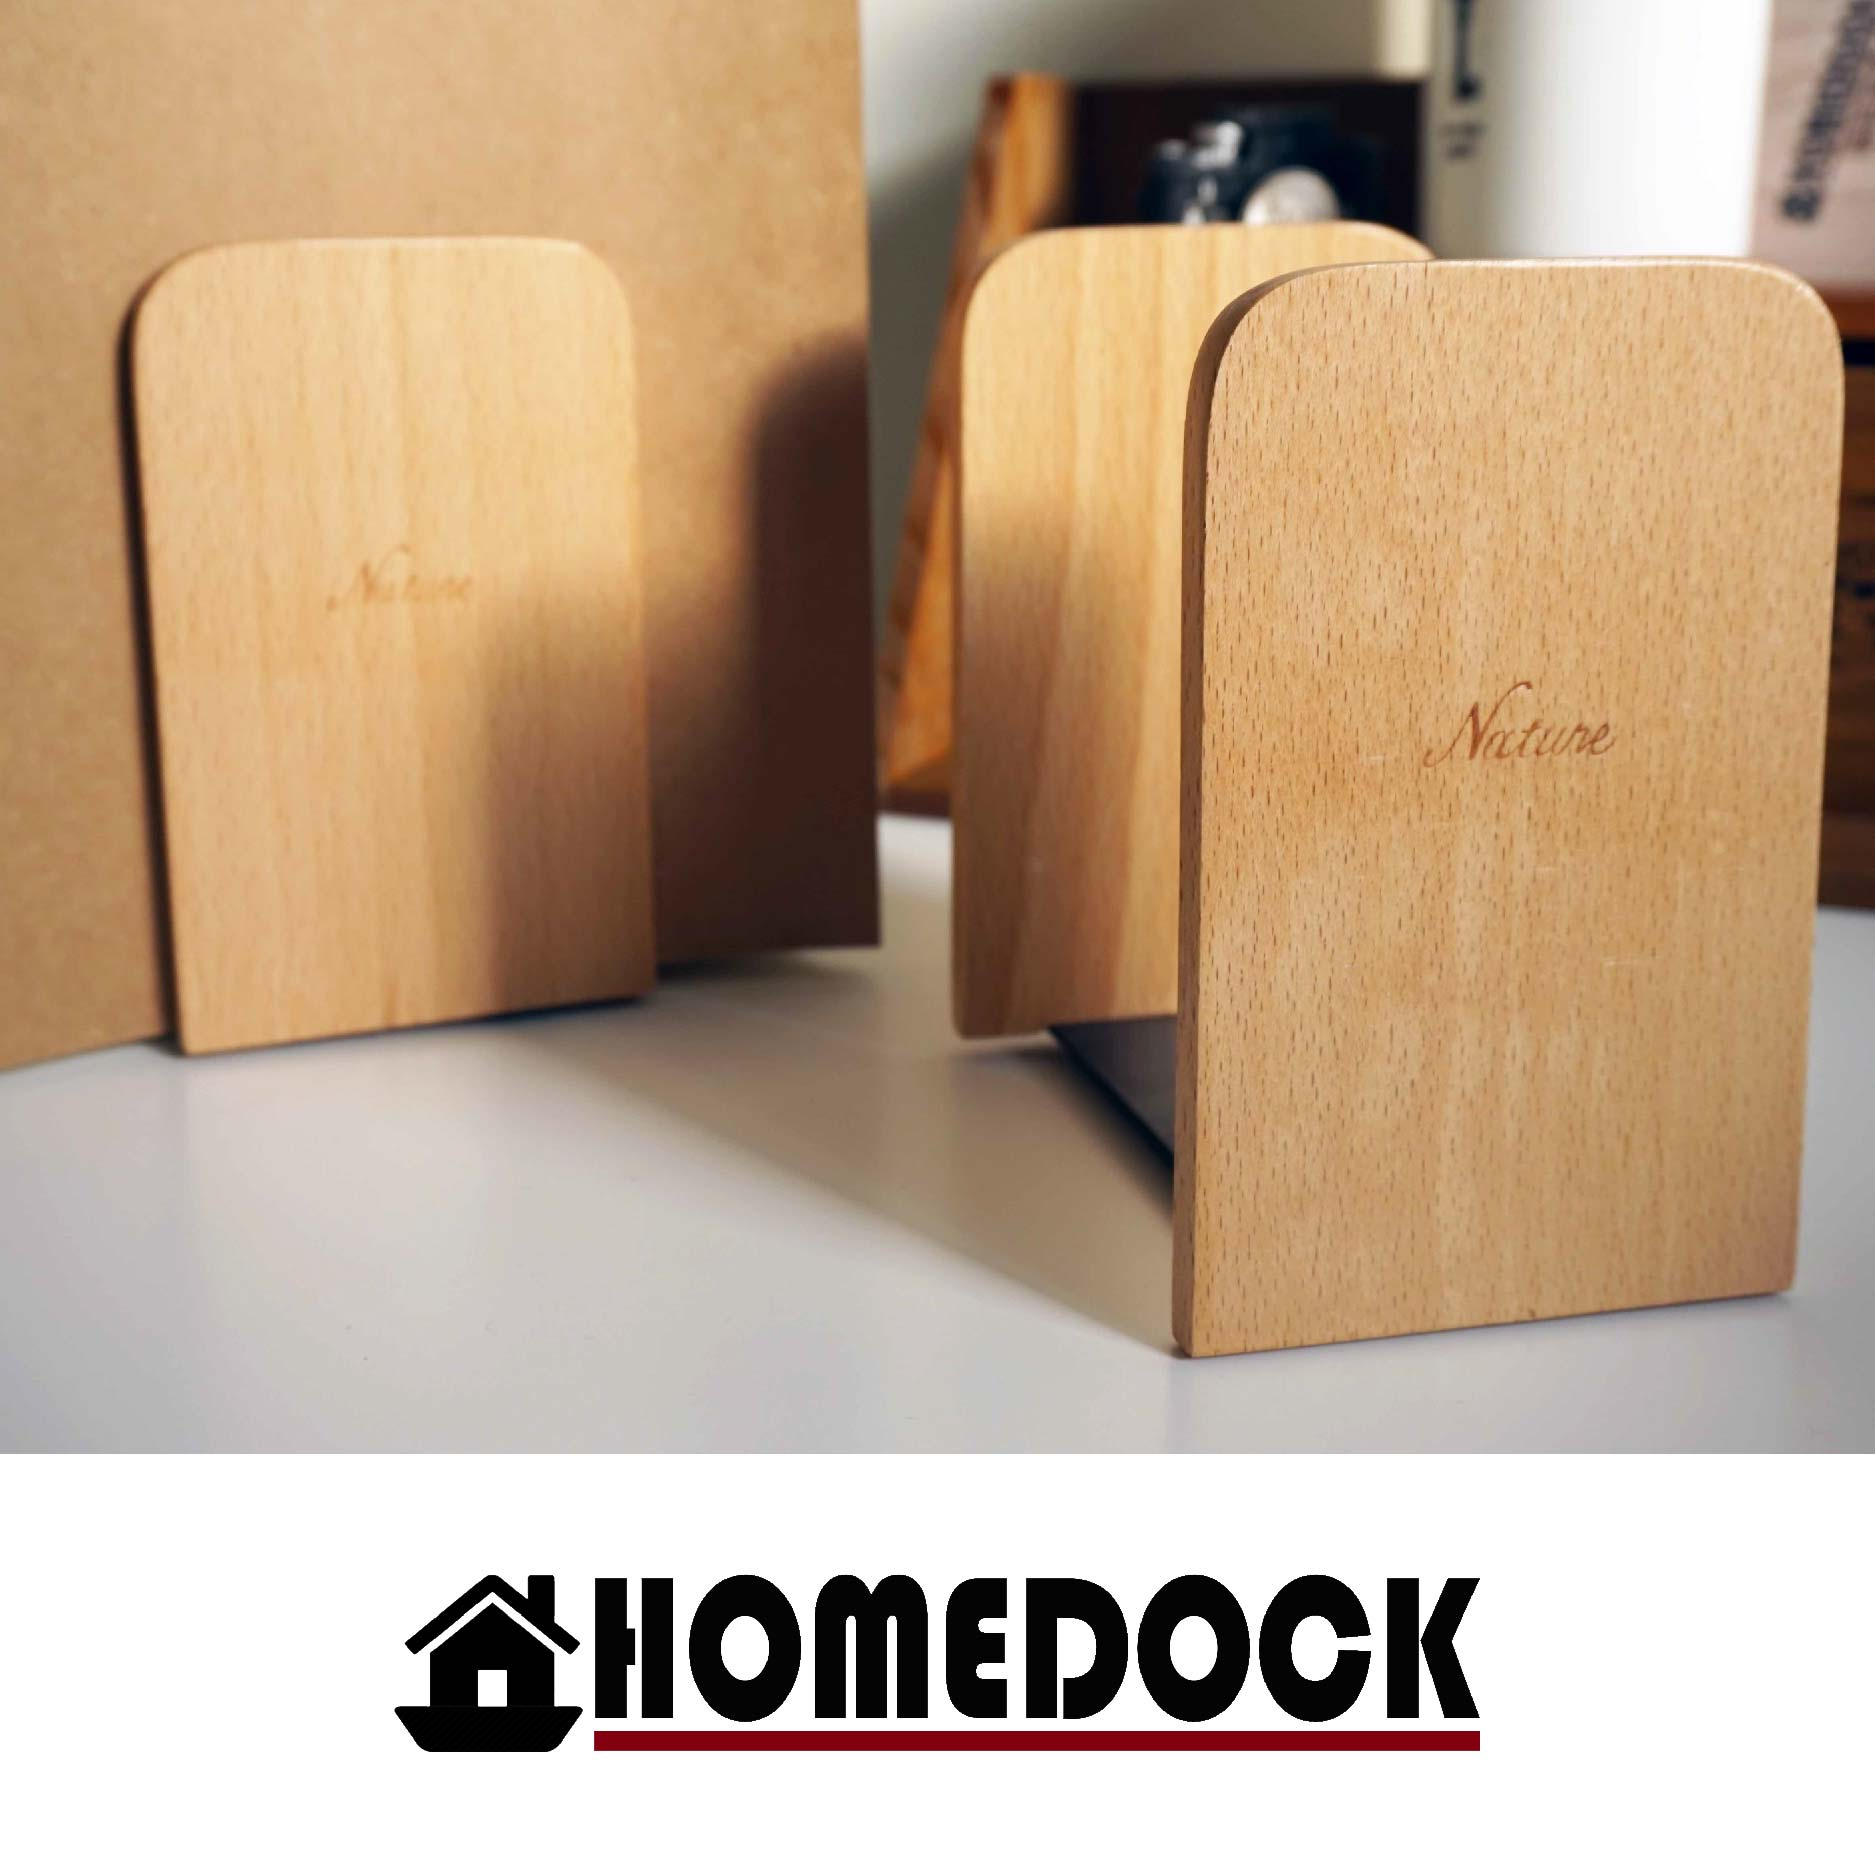 HOMEDOCK-輕生活原木質感書擋(1對) /書架/Zakka/雜貨/原木製/德國設計